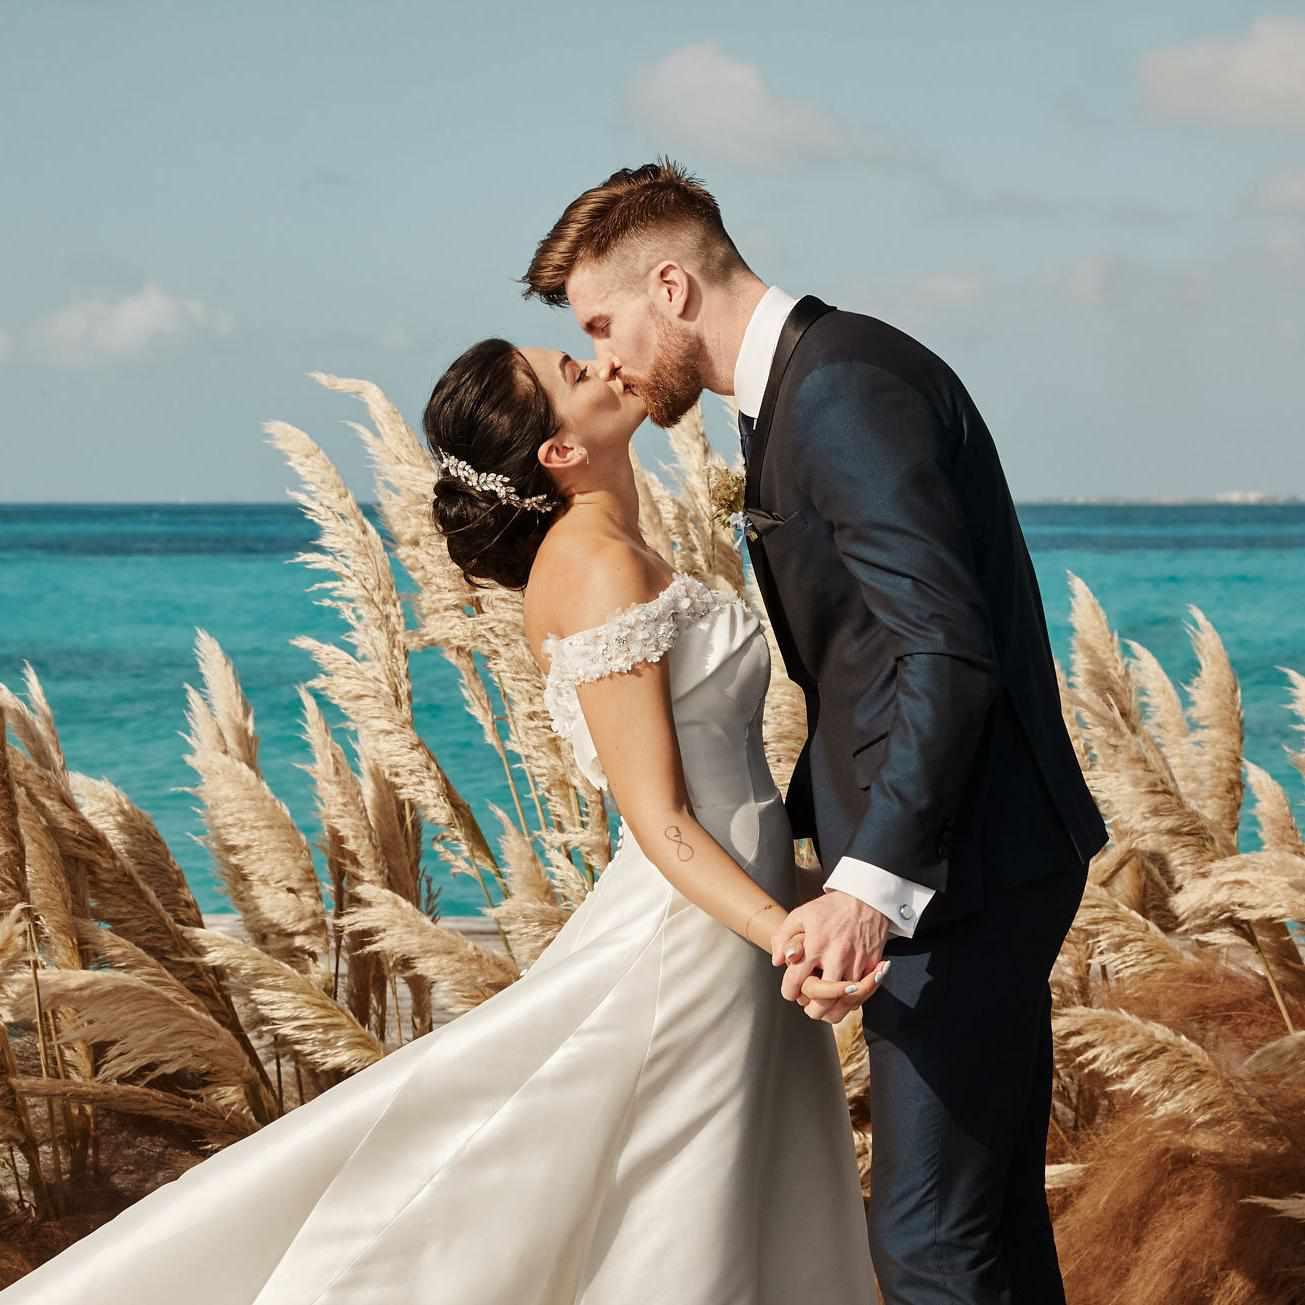 aa51b28a8f431 Andreea Cristina's Intimate Destination Wedding in Mexico